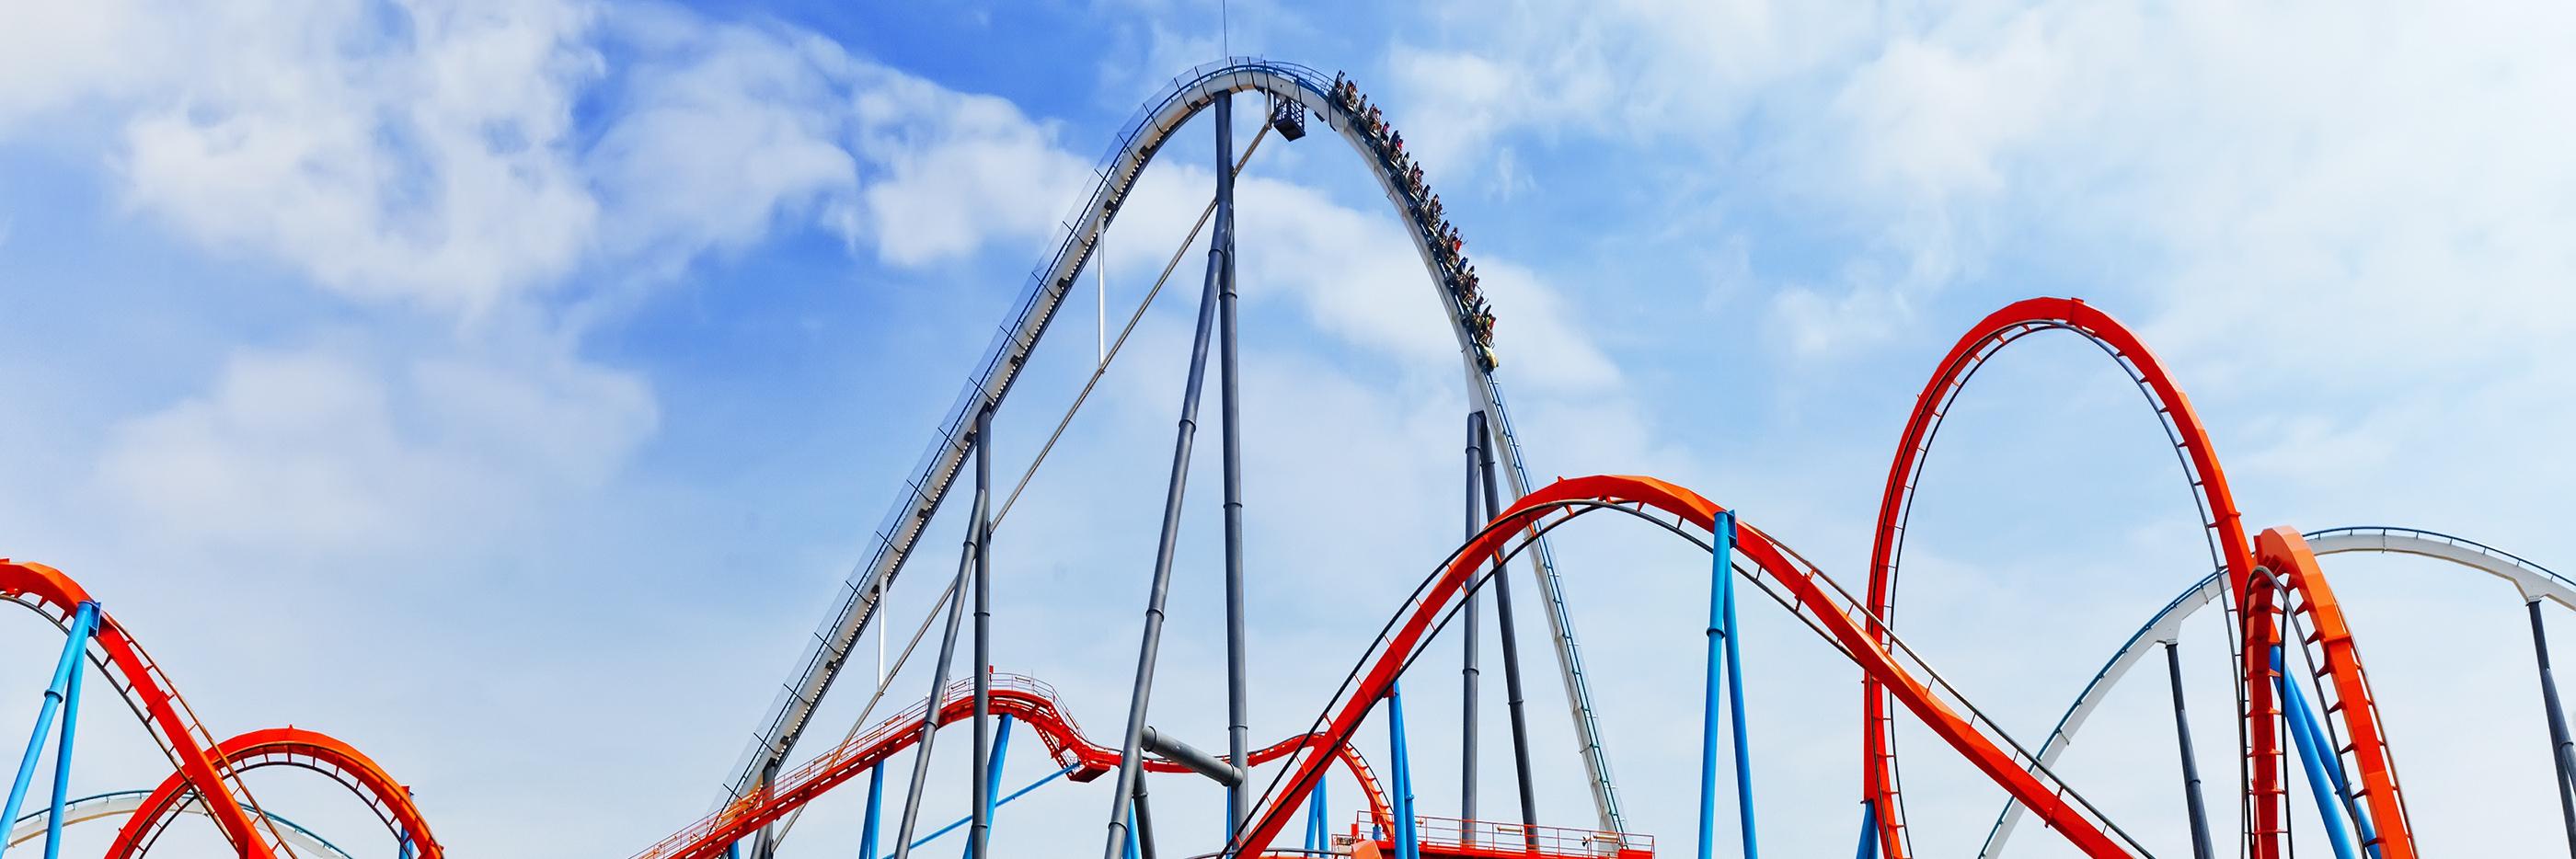 Roller coaster in amusement park.